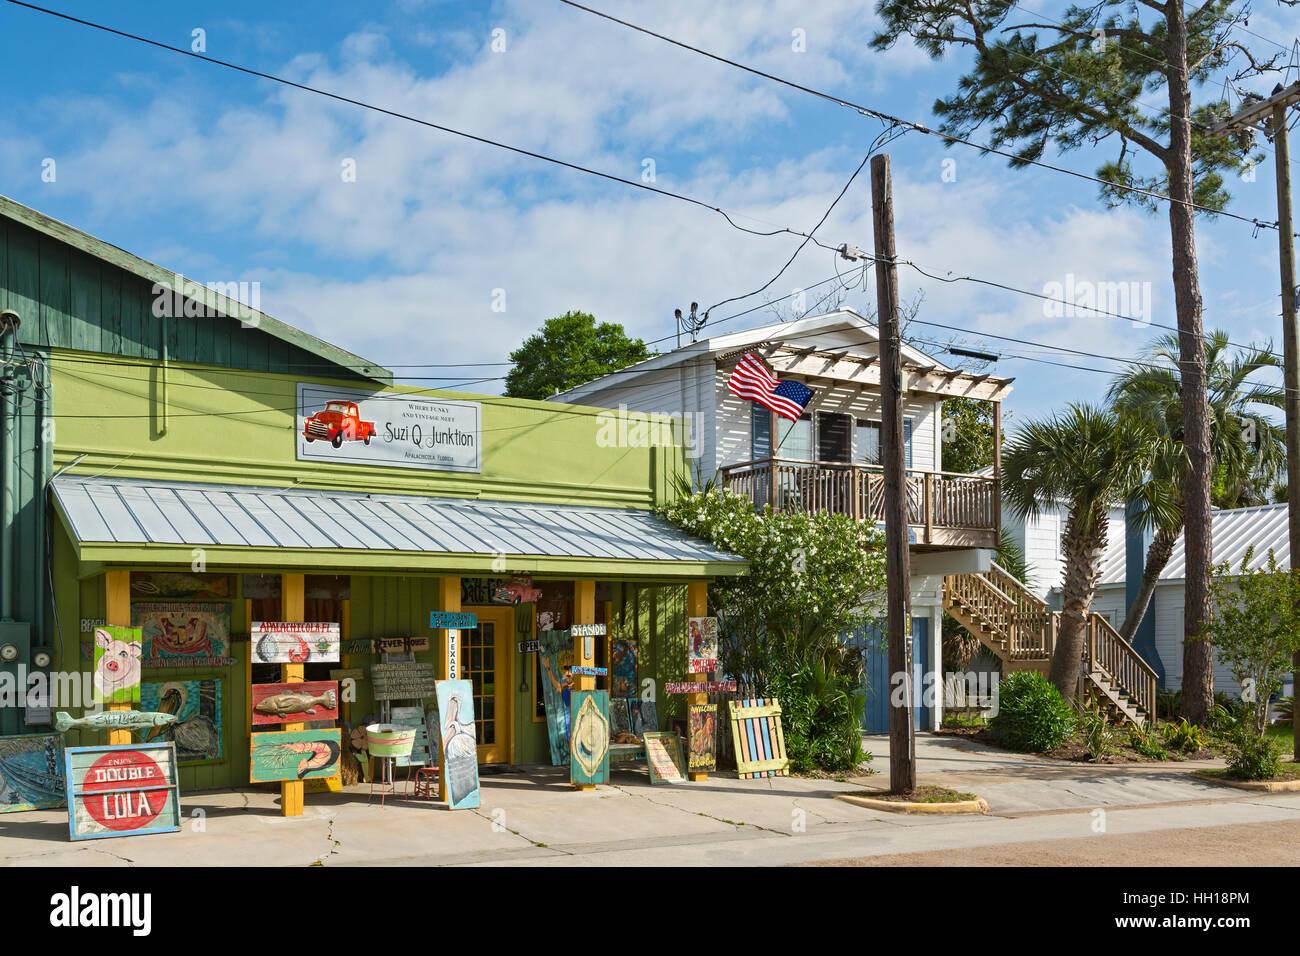 Florida, Apalachicola, gallery - Stock Image